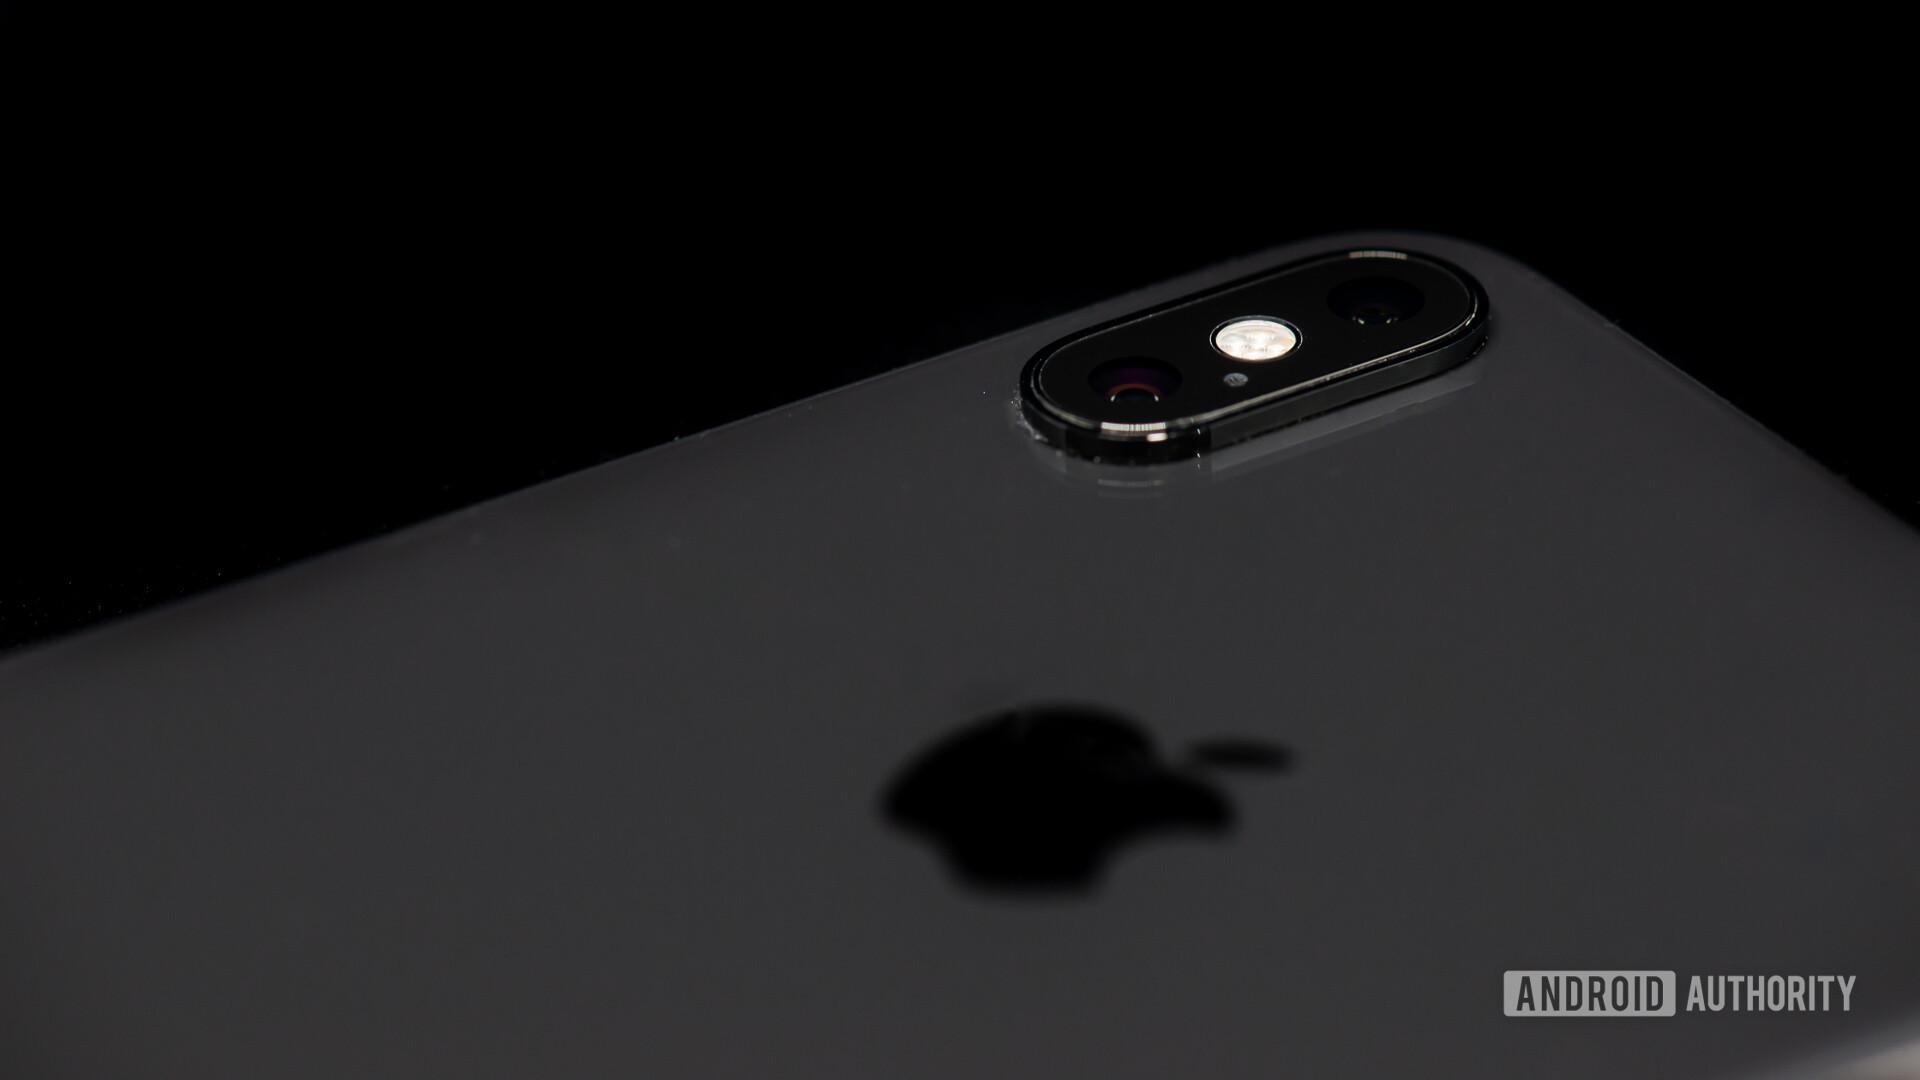 iPhone XS Max closeup on camera module and Apple logo